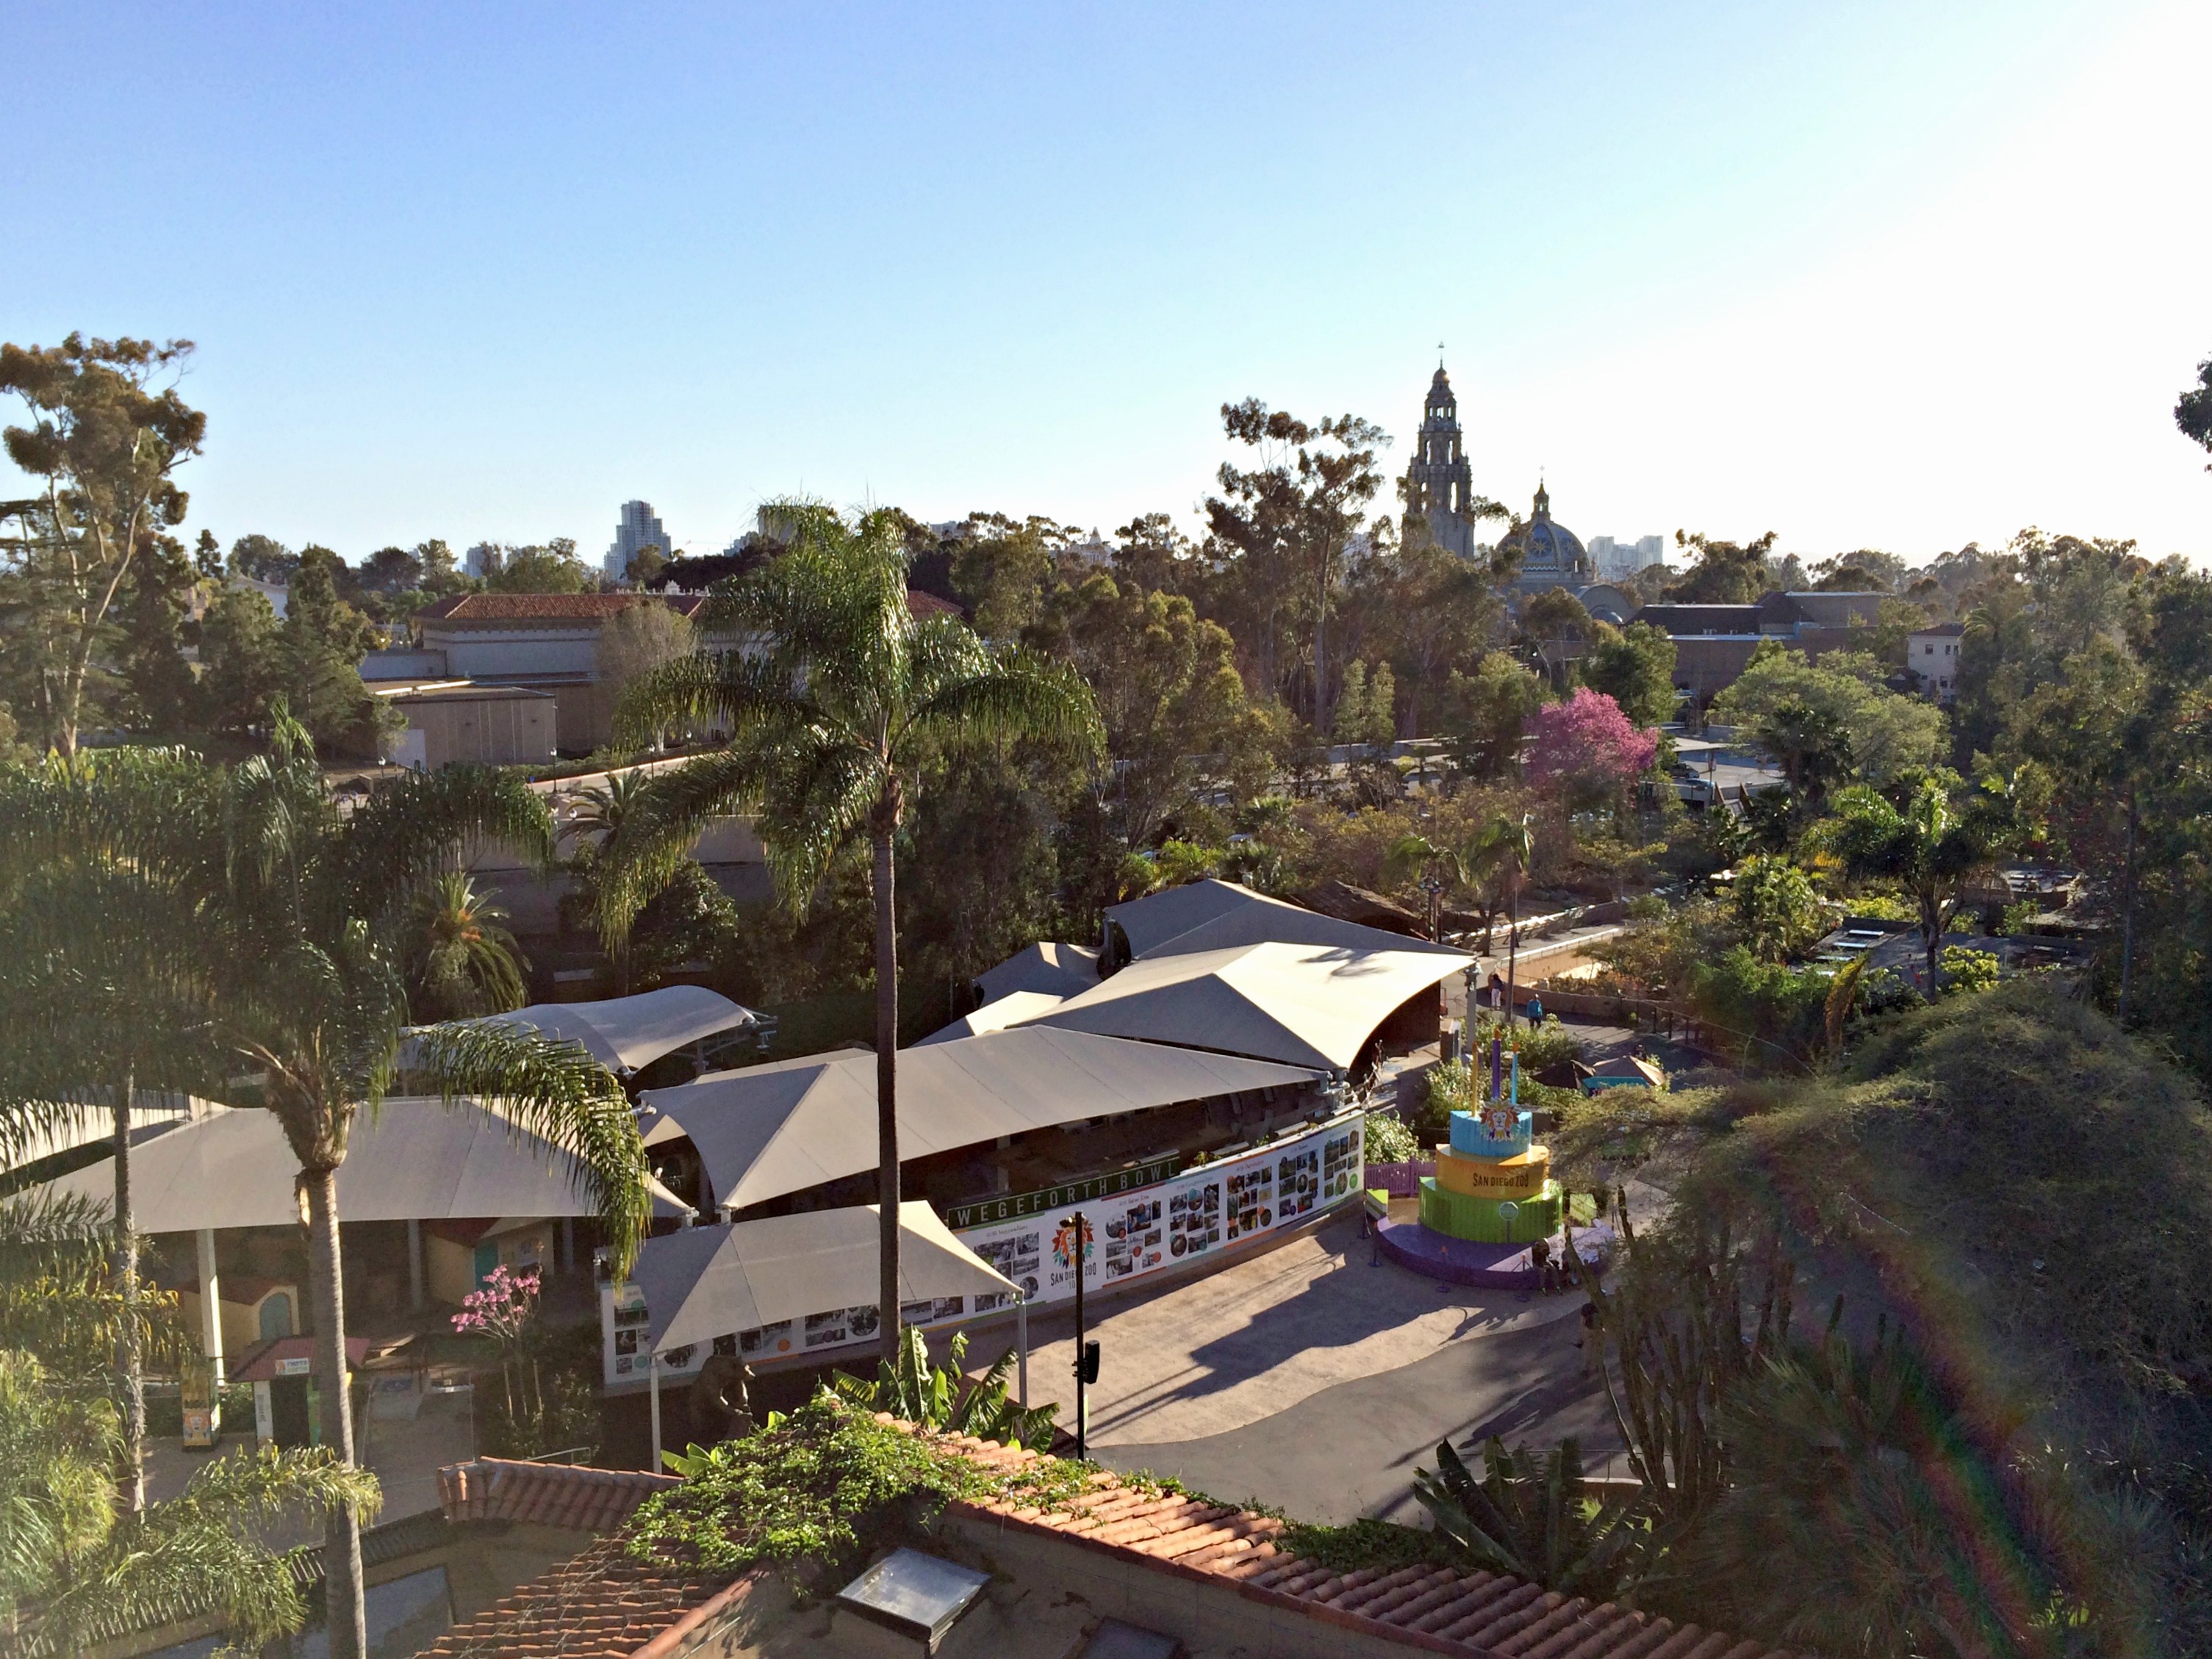 san diego zoo skyway view